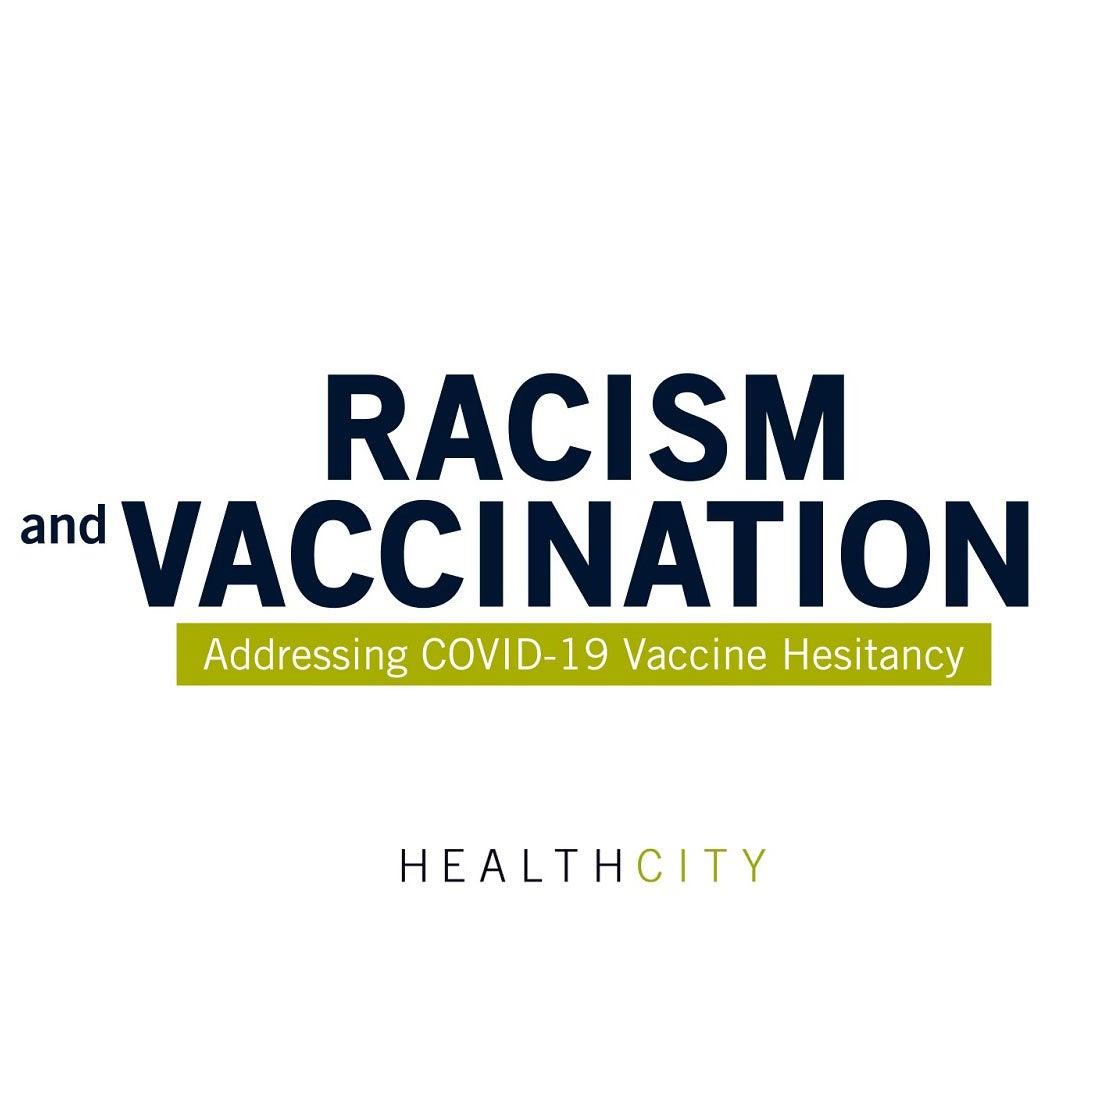 covid-19 vaccine concerns video